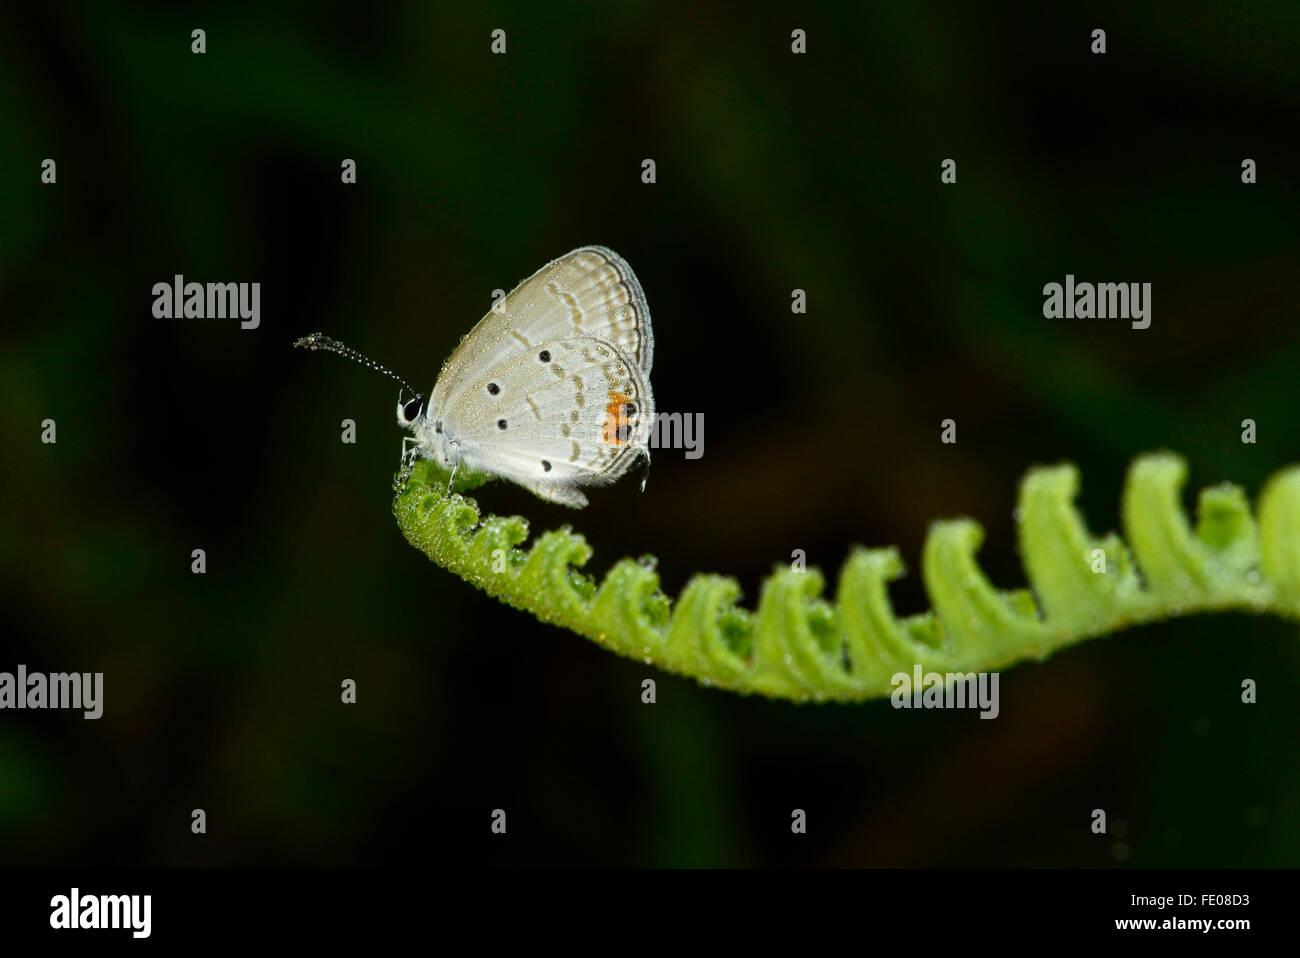 Largo de Sri Lanka-tailed Mariposa Azul (Lampides boeticus) adulto cubierto de rocío, reposando sobre hojas Imagen De Stock